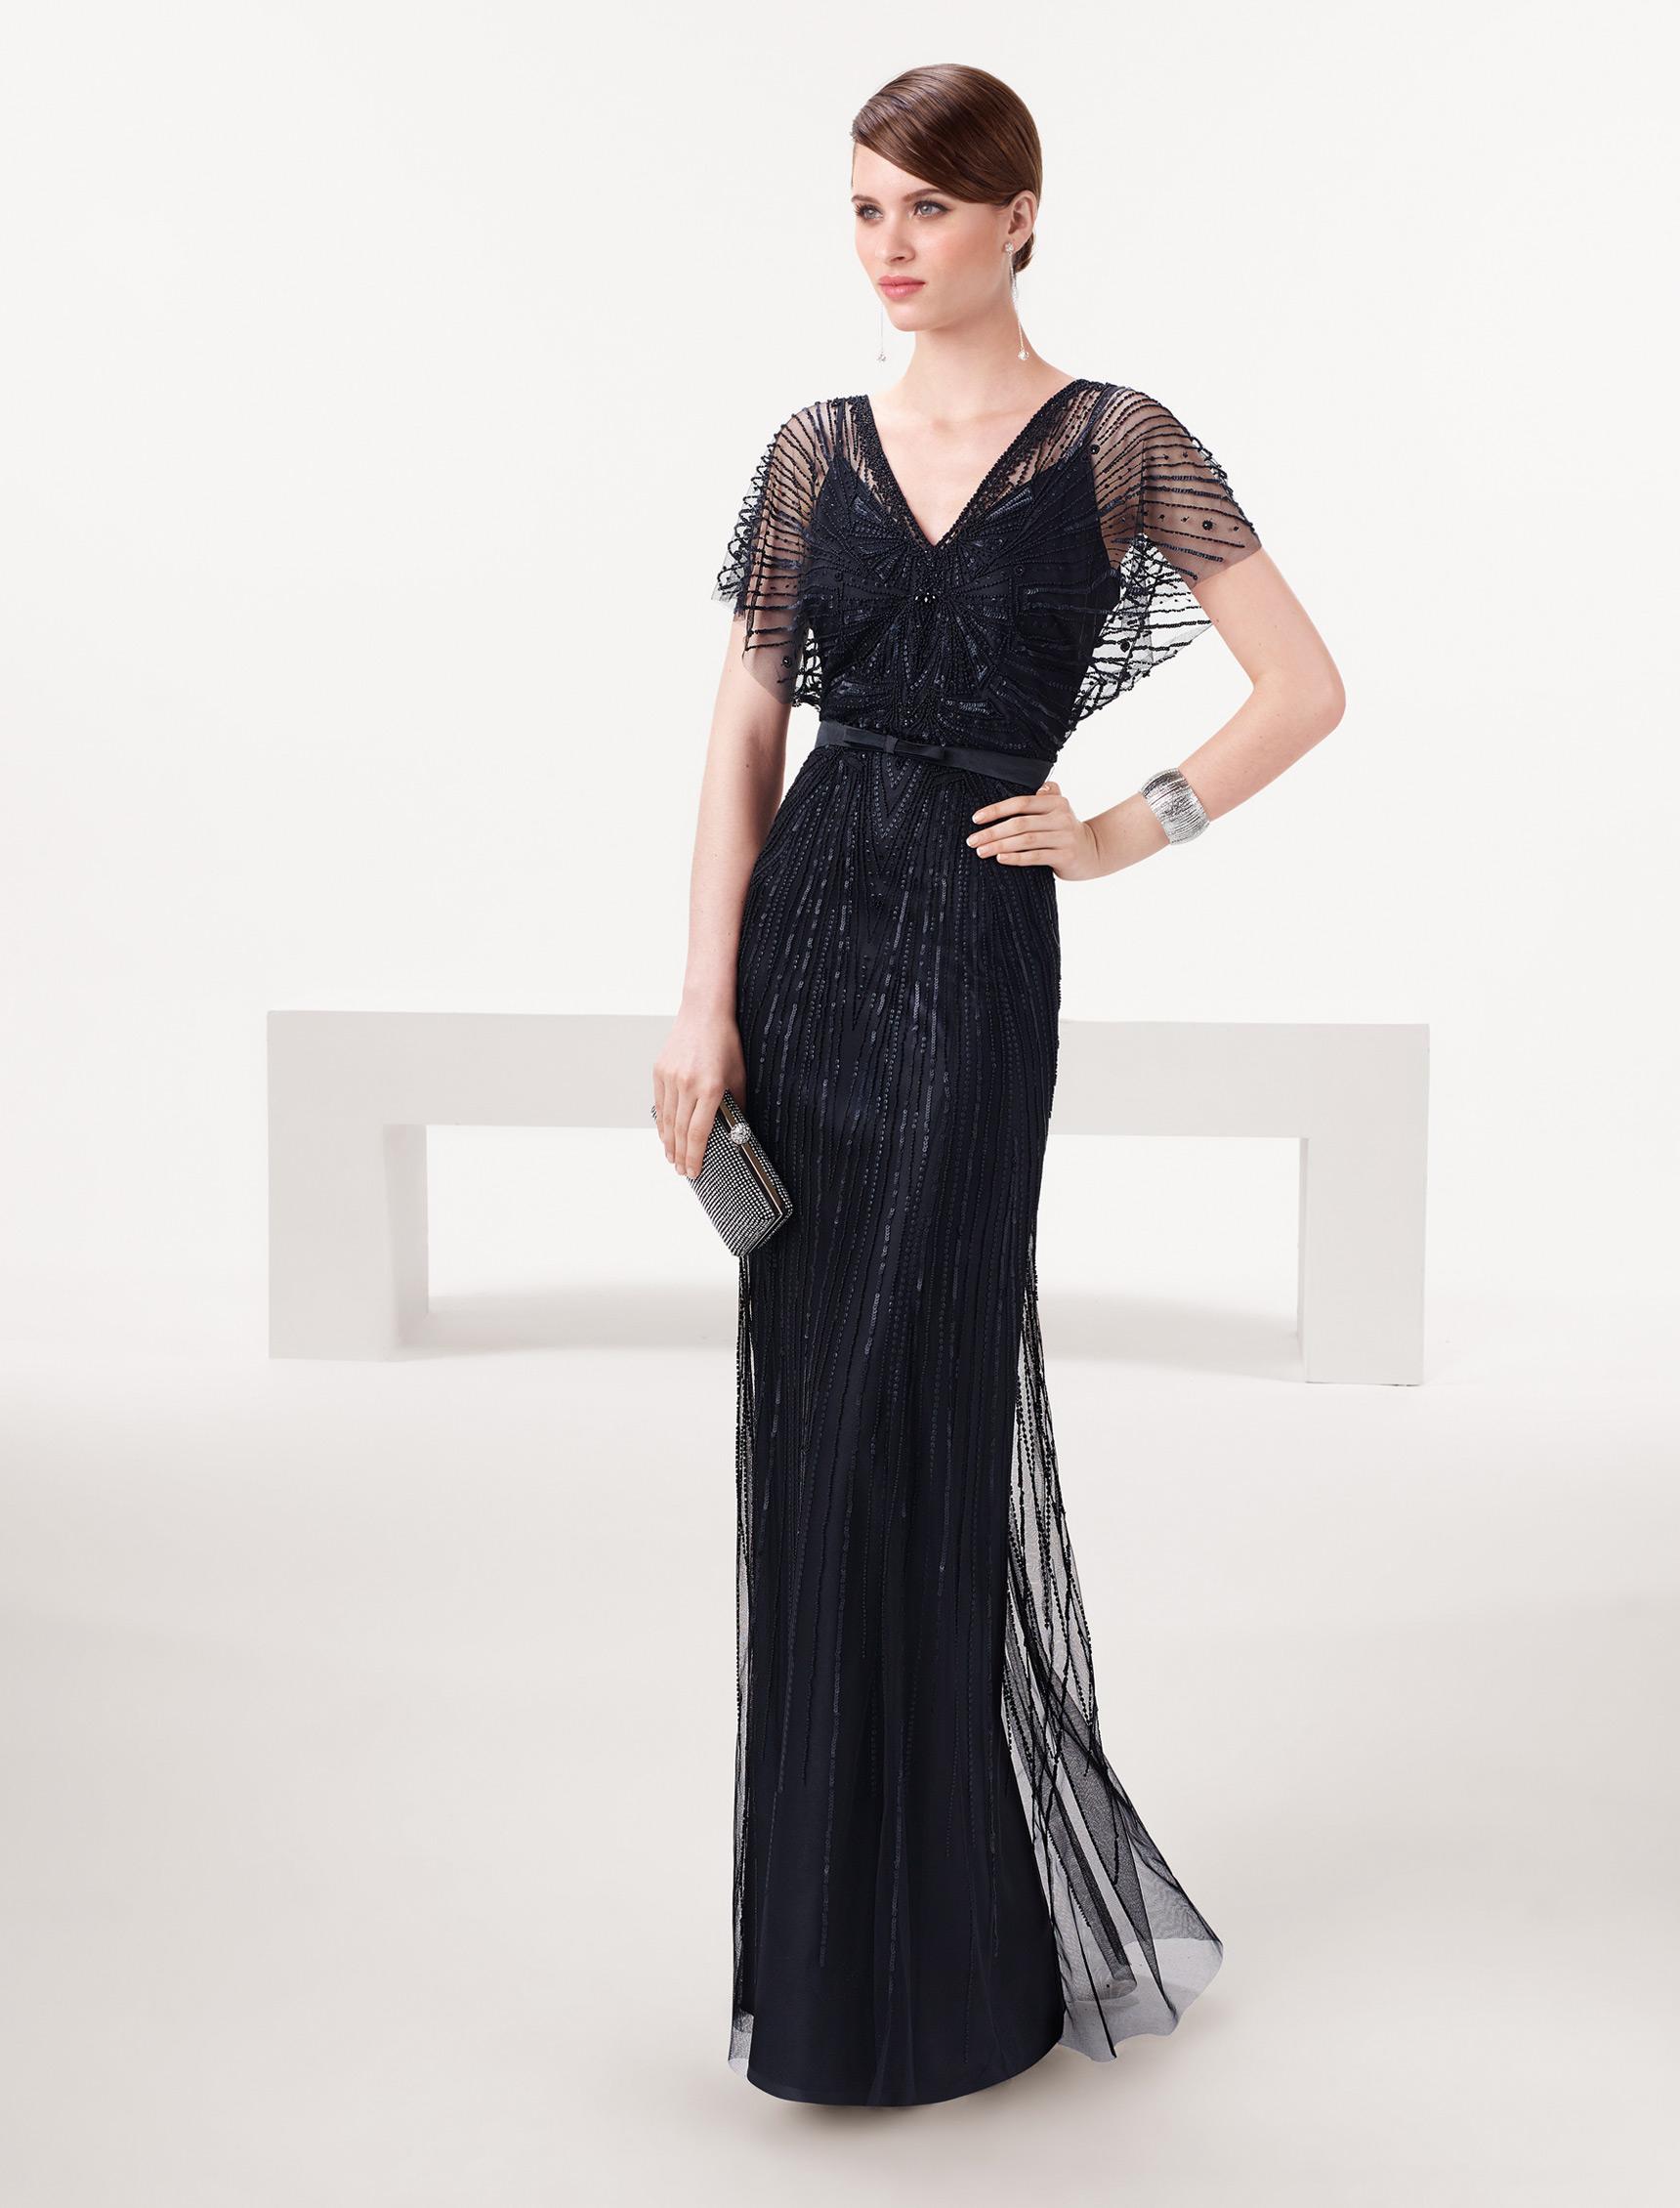 última venta 50-70% de descuento 100% genuino LA NOVIA Couture - Evening dresses in Latvia - ROSA CLARA ...